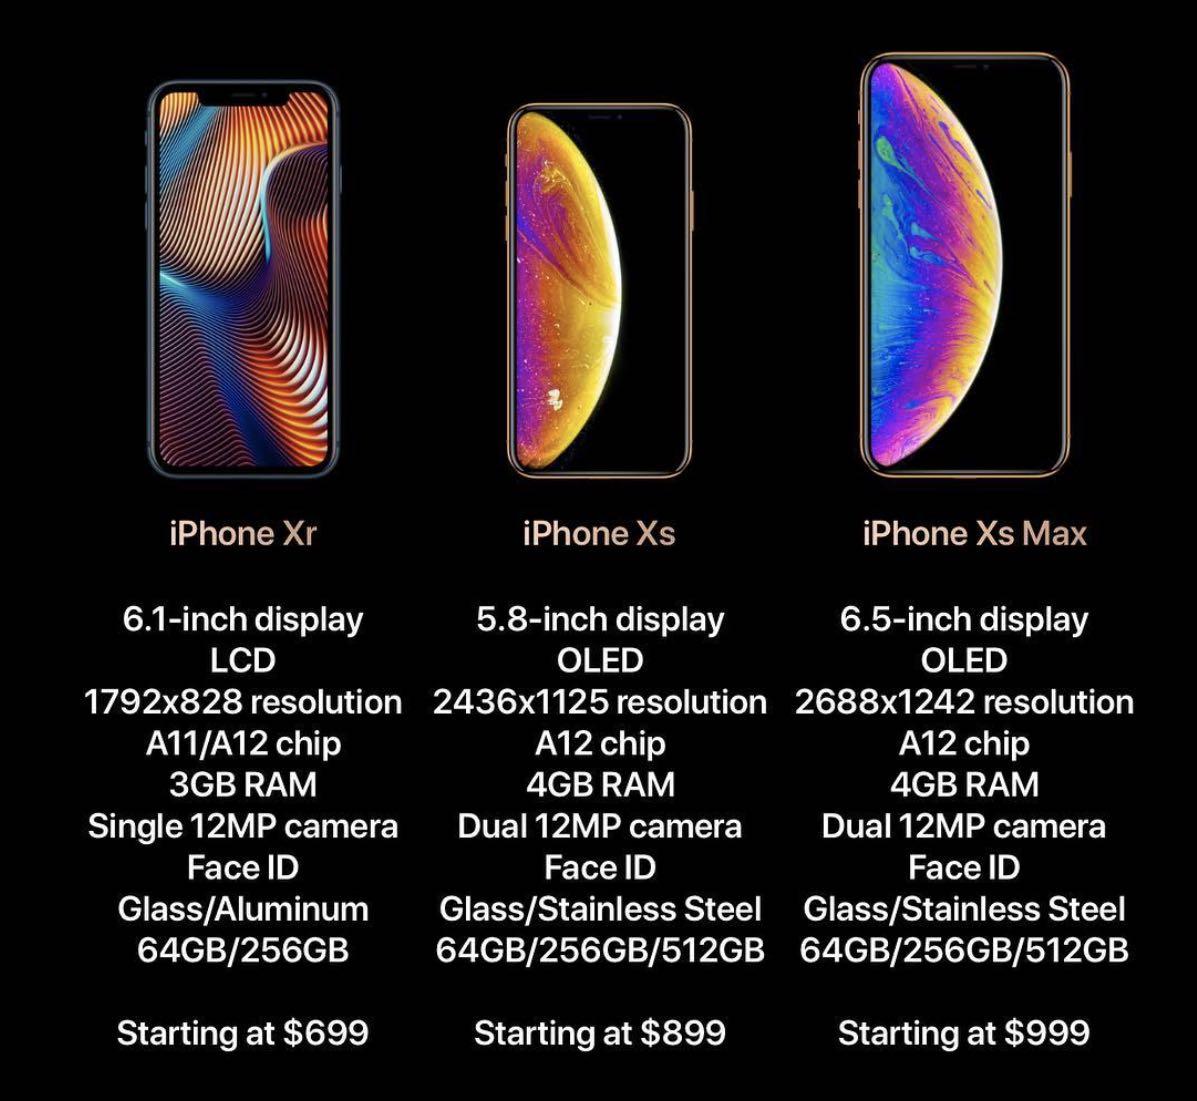 iPhone Xs, iPhone Xs Max та iPhone Xr